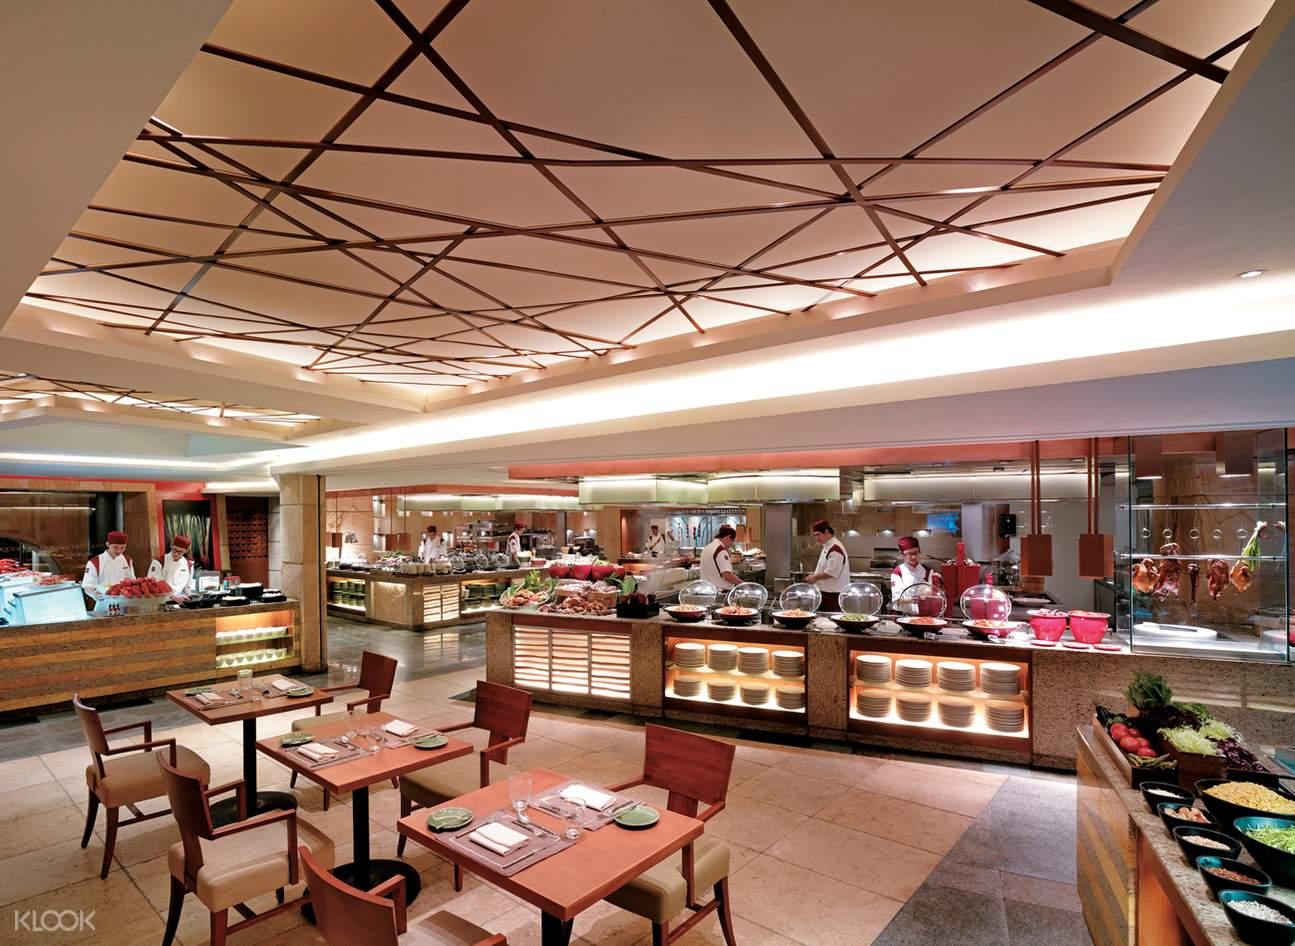 Café Kool 咖啡厅